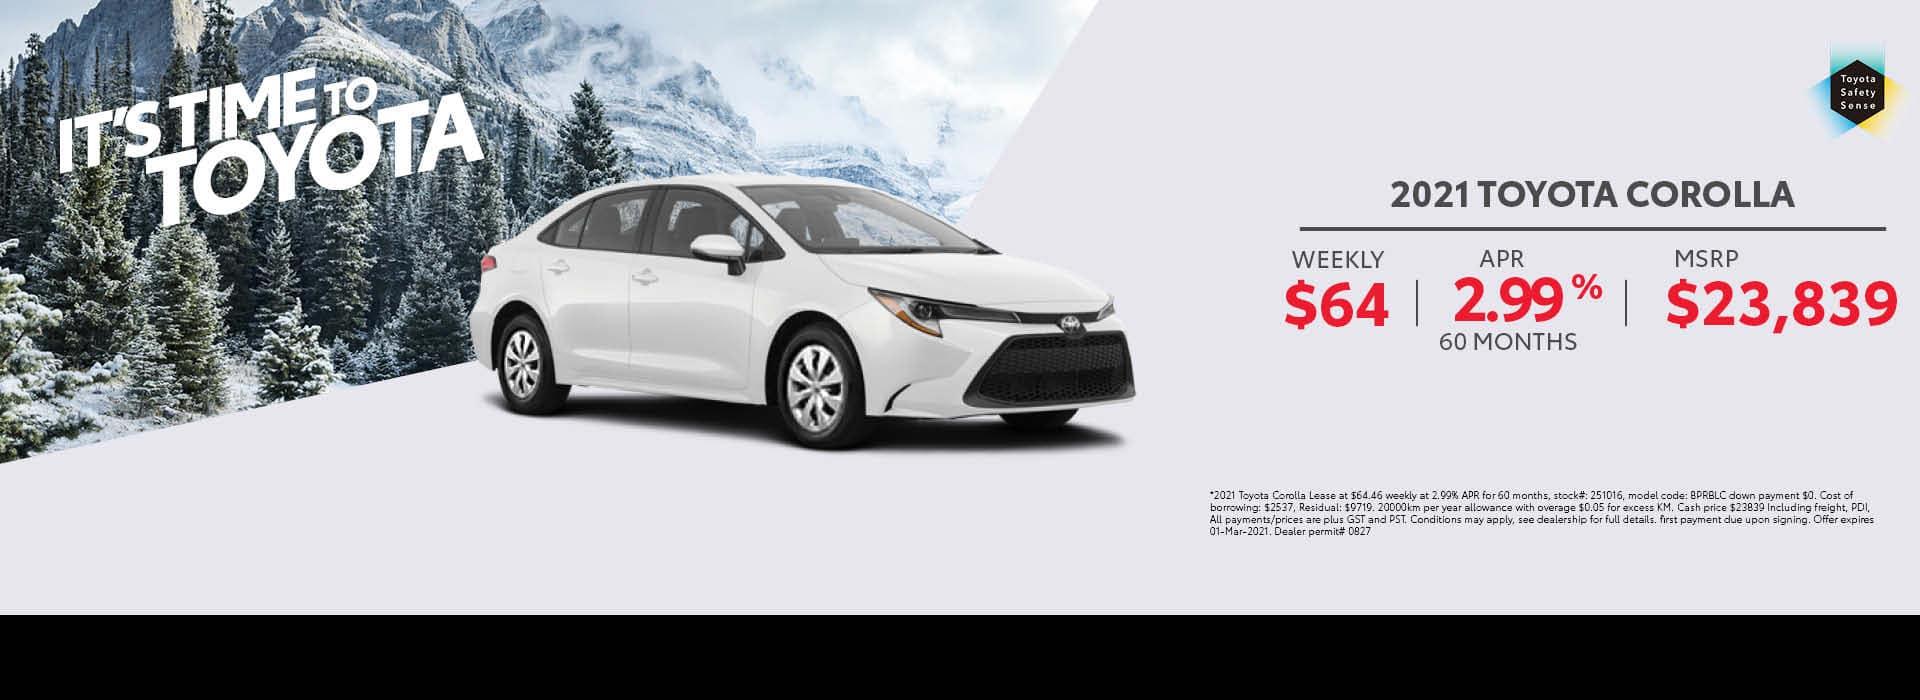 2021_Toyota_Corolla_Hatchback_Desktop_Home_Page_Banner_Feb20212